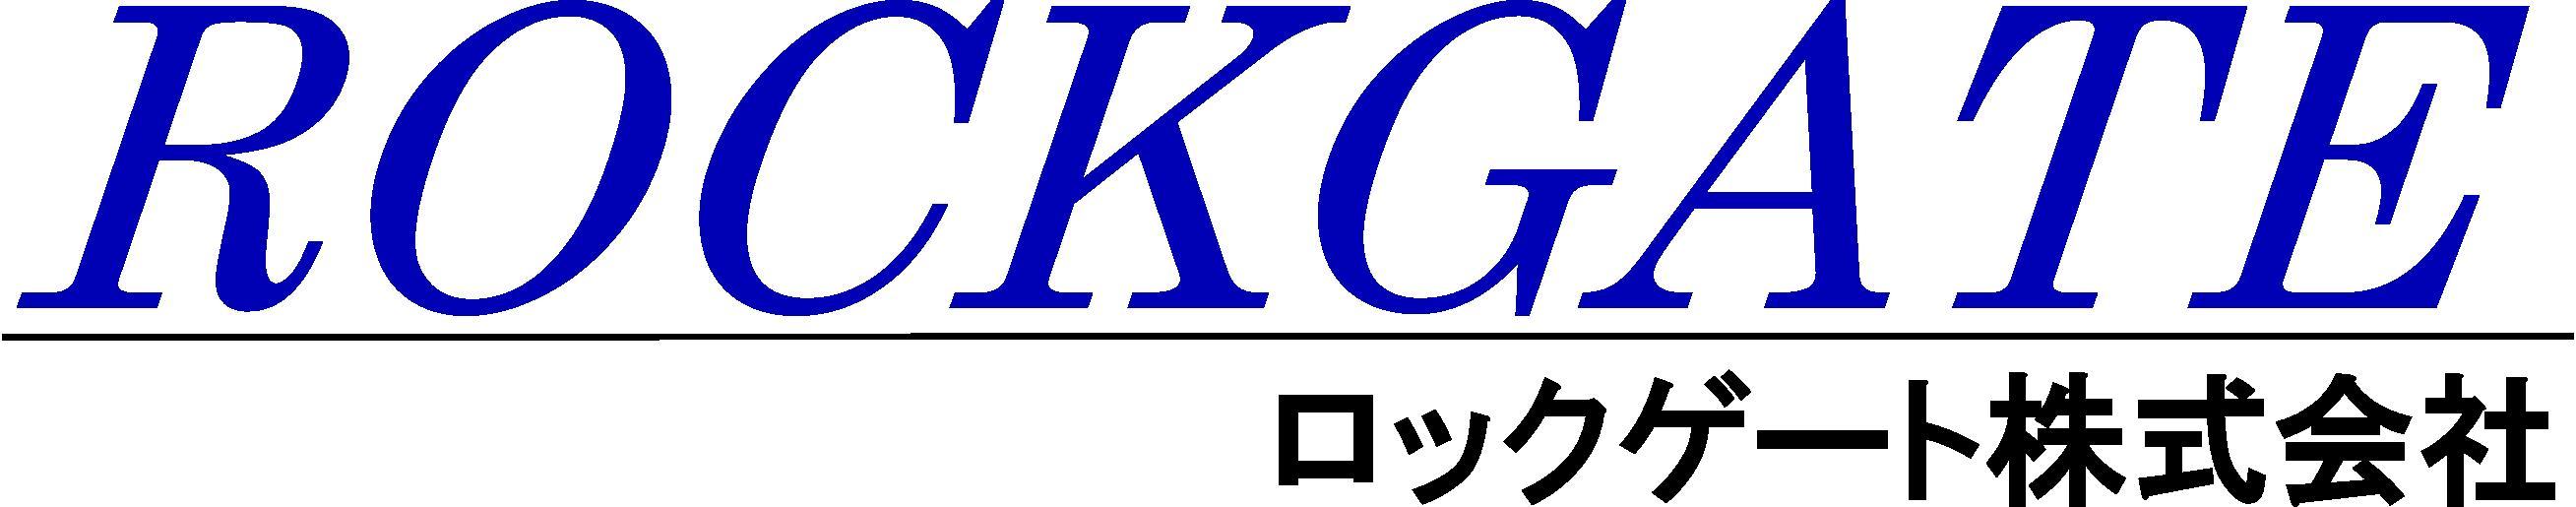 Rockgate Corporation